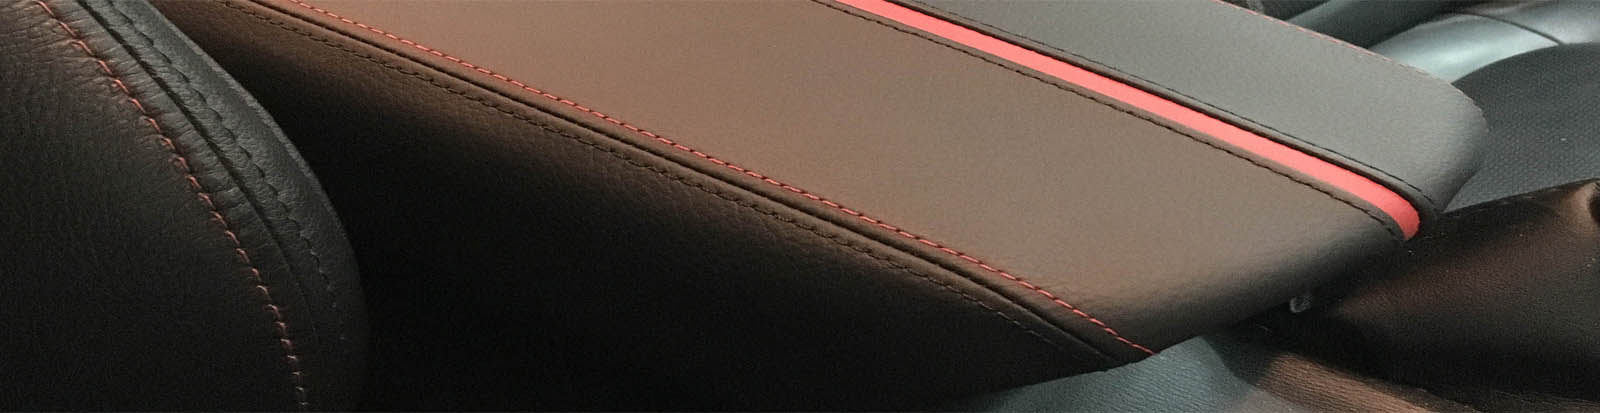 Перетяжка подлокотника и ручки акпп Mazda